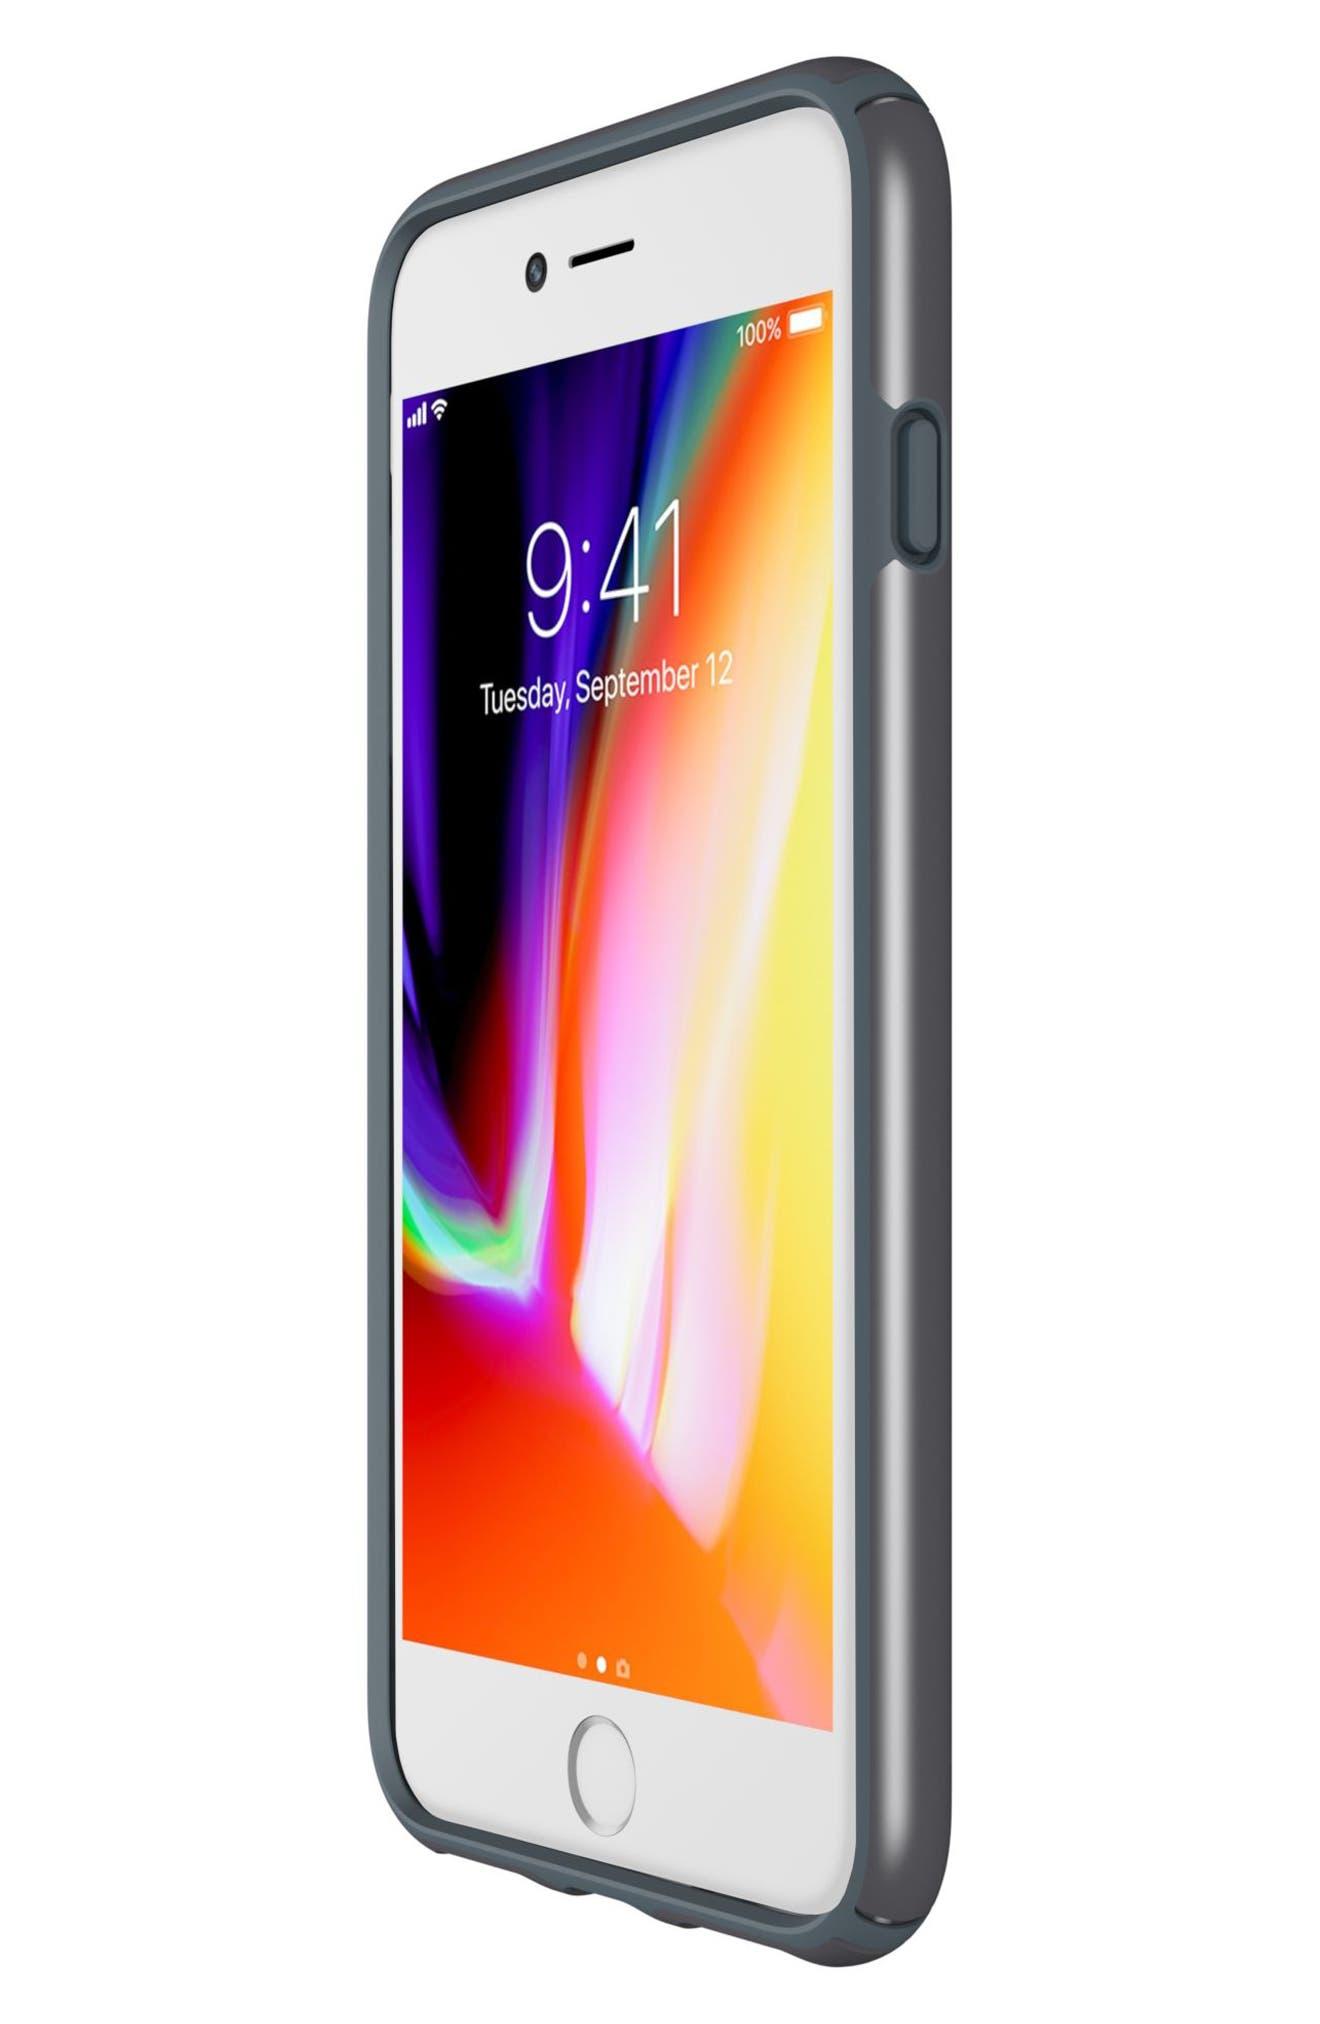 iPhone 6/6s/7/8 Case,                             Alternate thumbnail 6, color,                             Tungsten Grey Metallic/ Grey